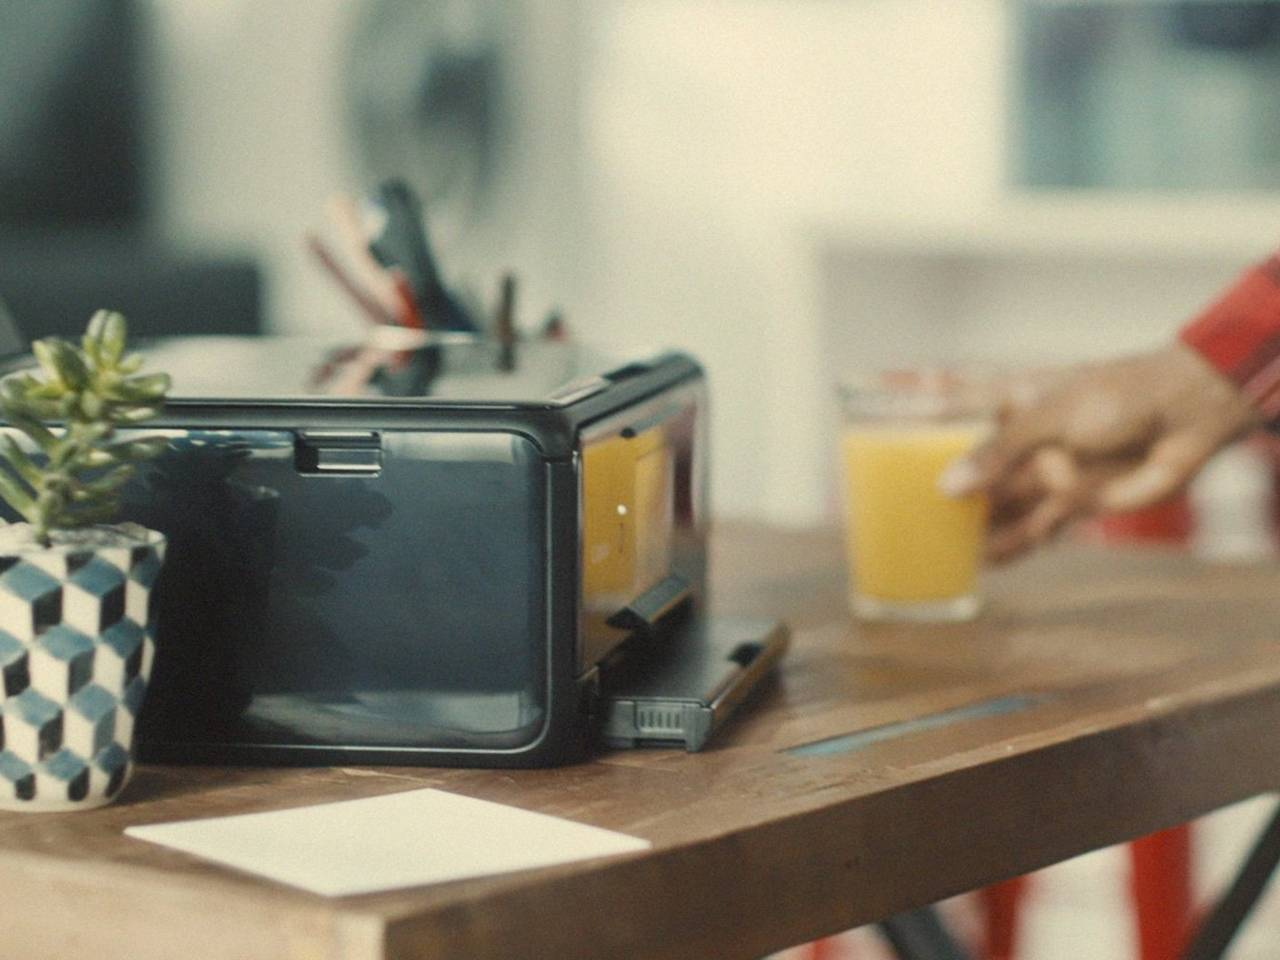 PIXMA_TS_8040 product lifestyle video